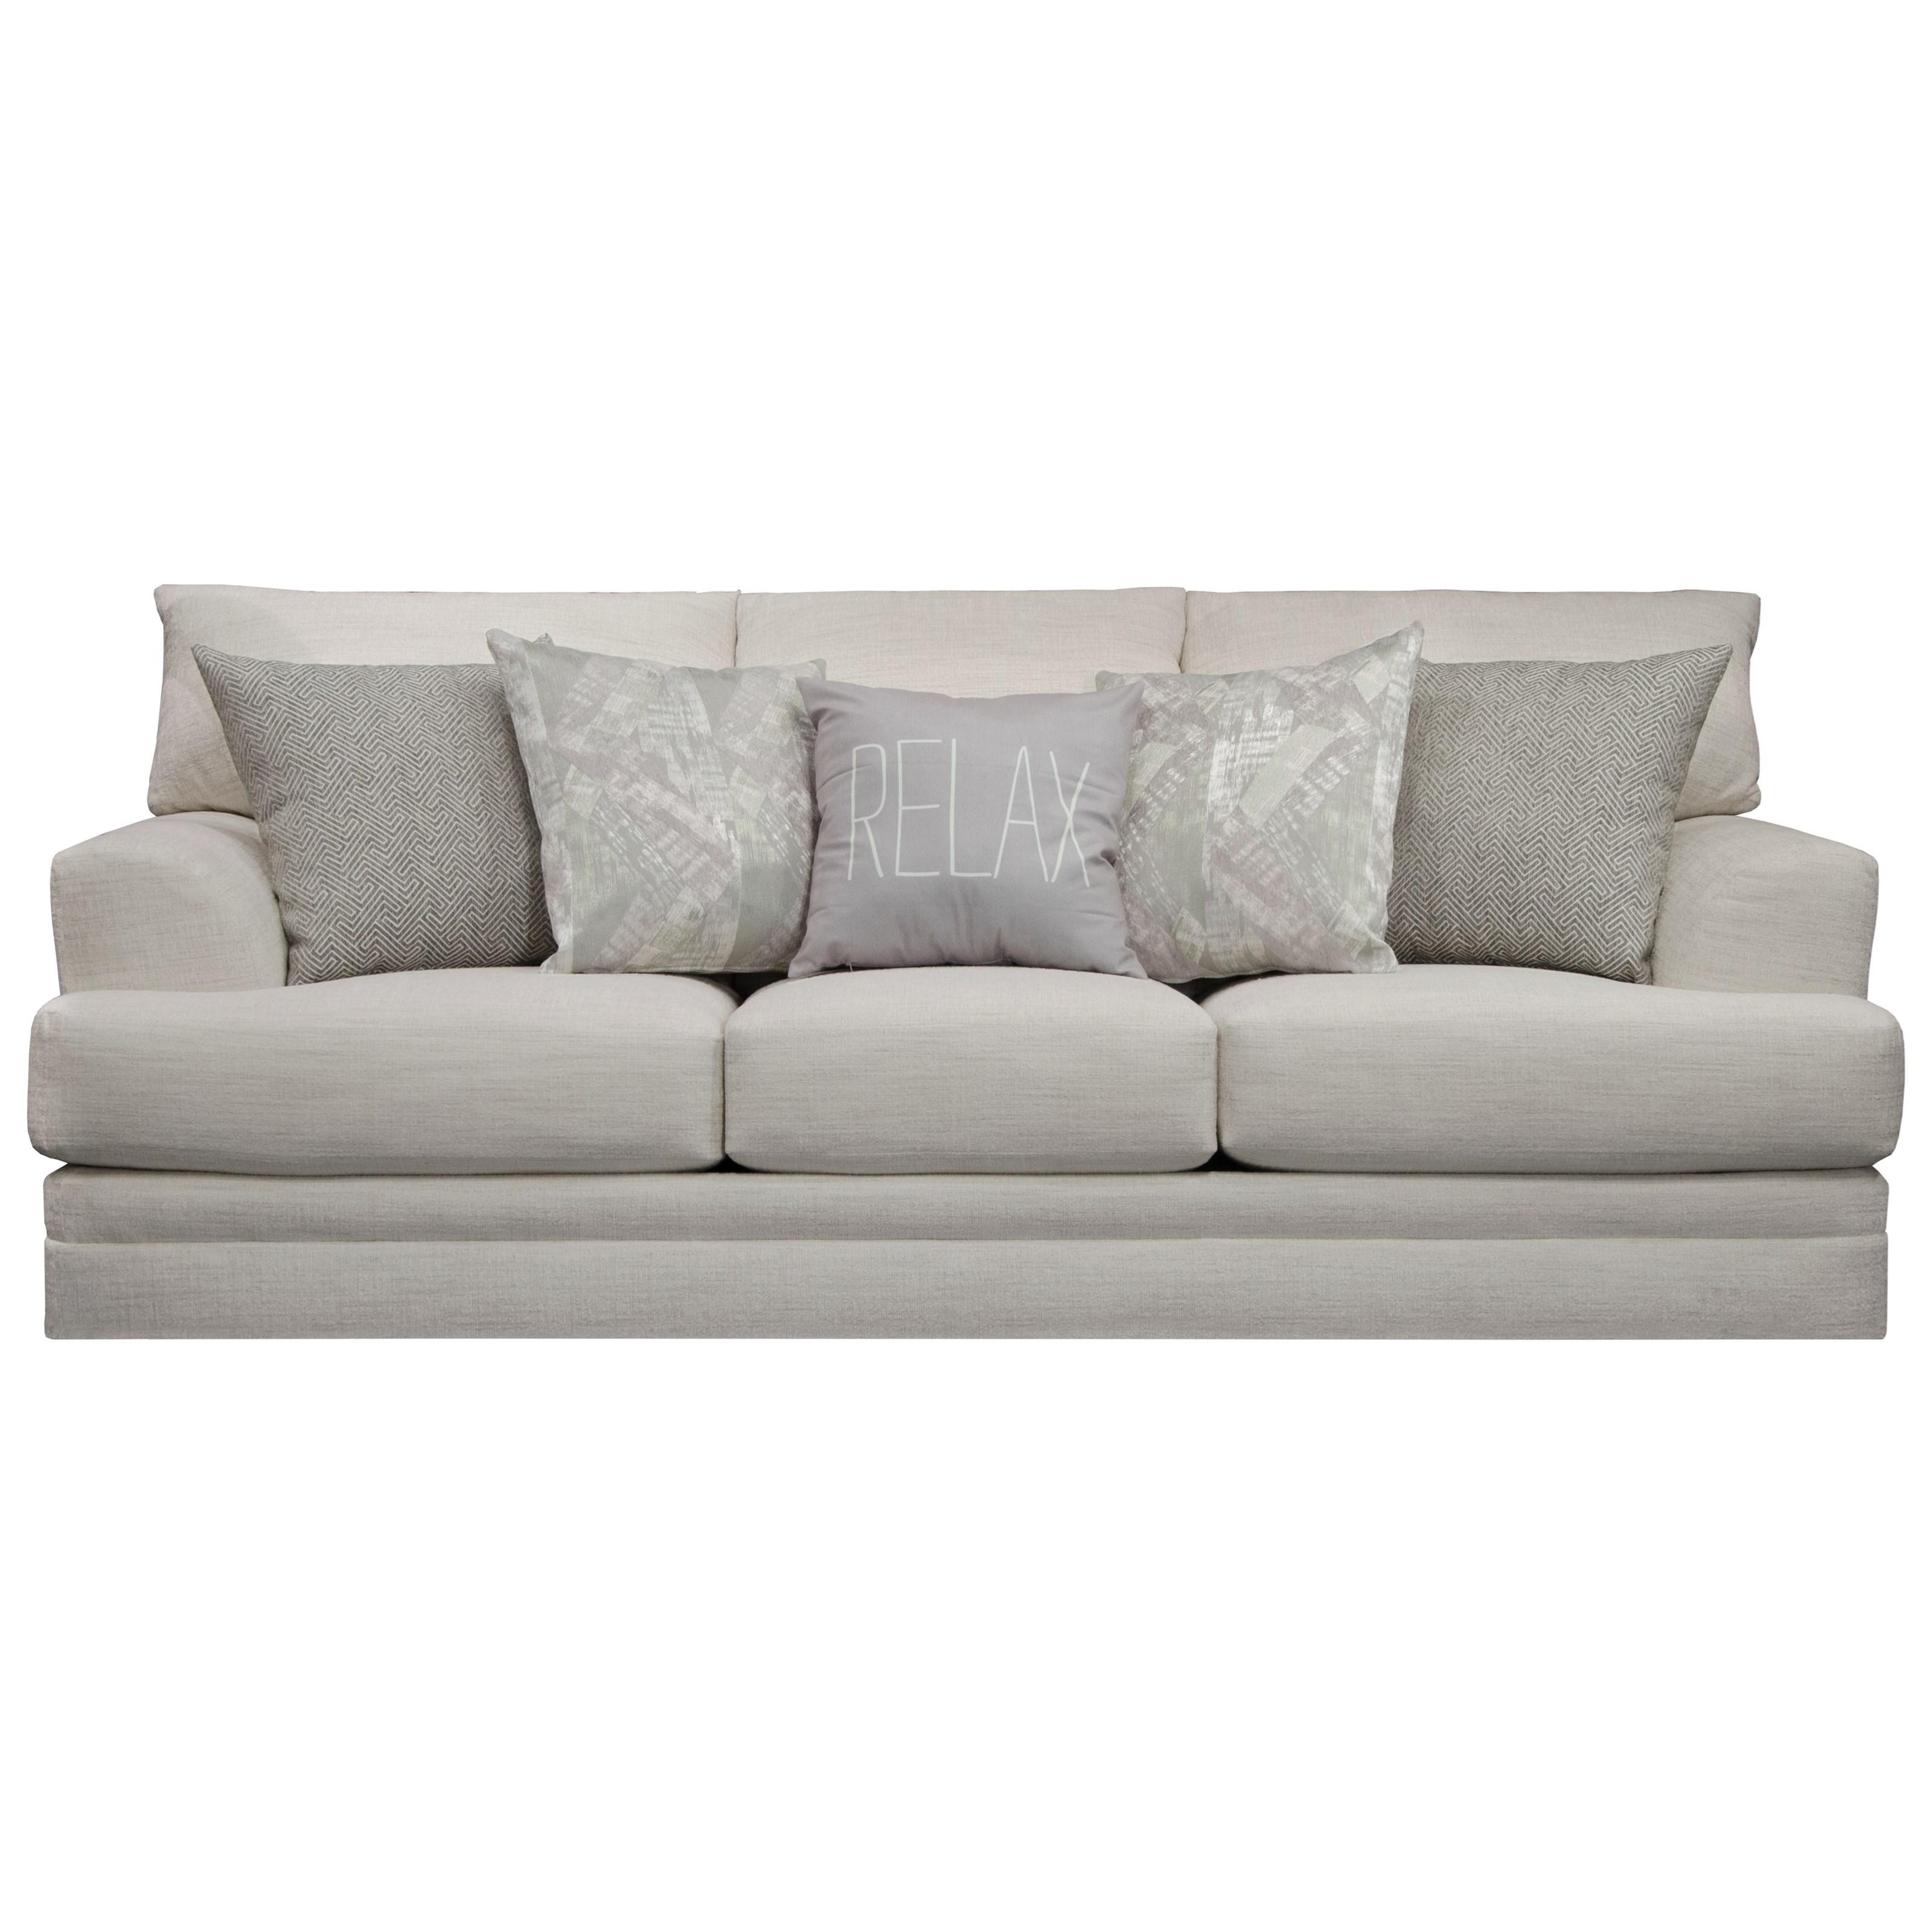 Zeller Sofa by Jackson Furniture at Johnny Janosik